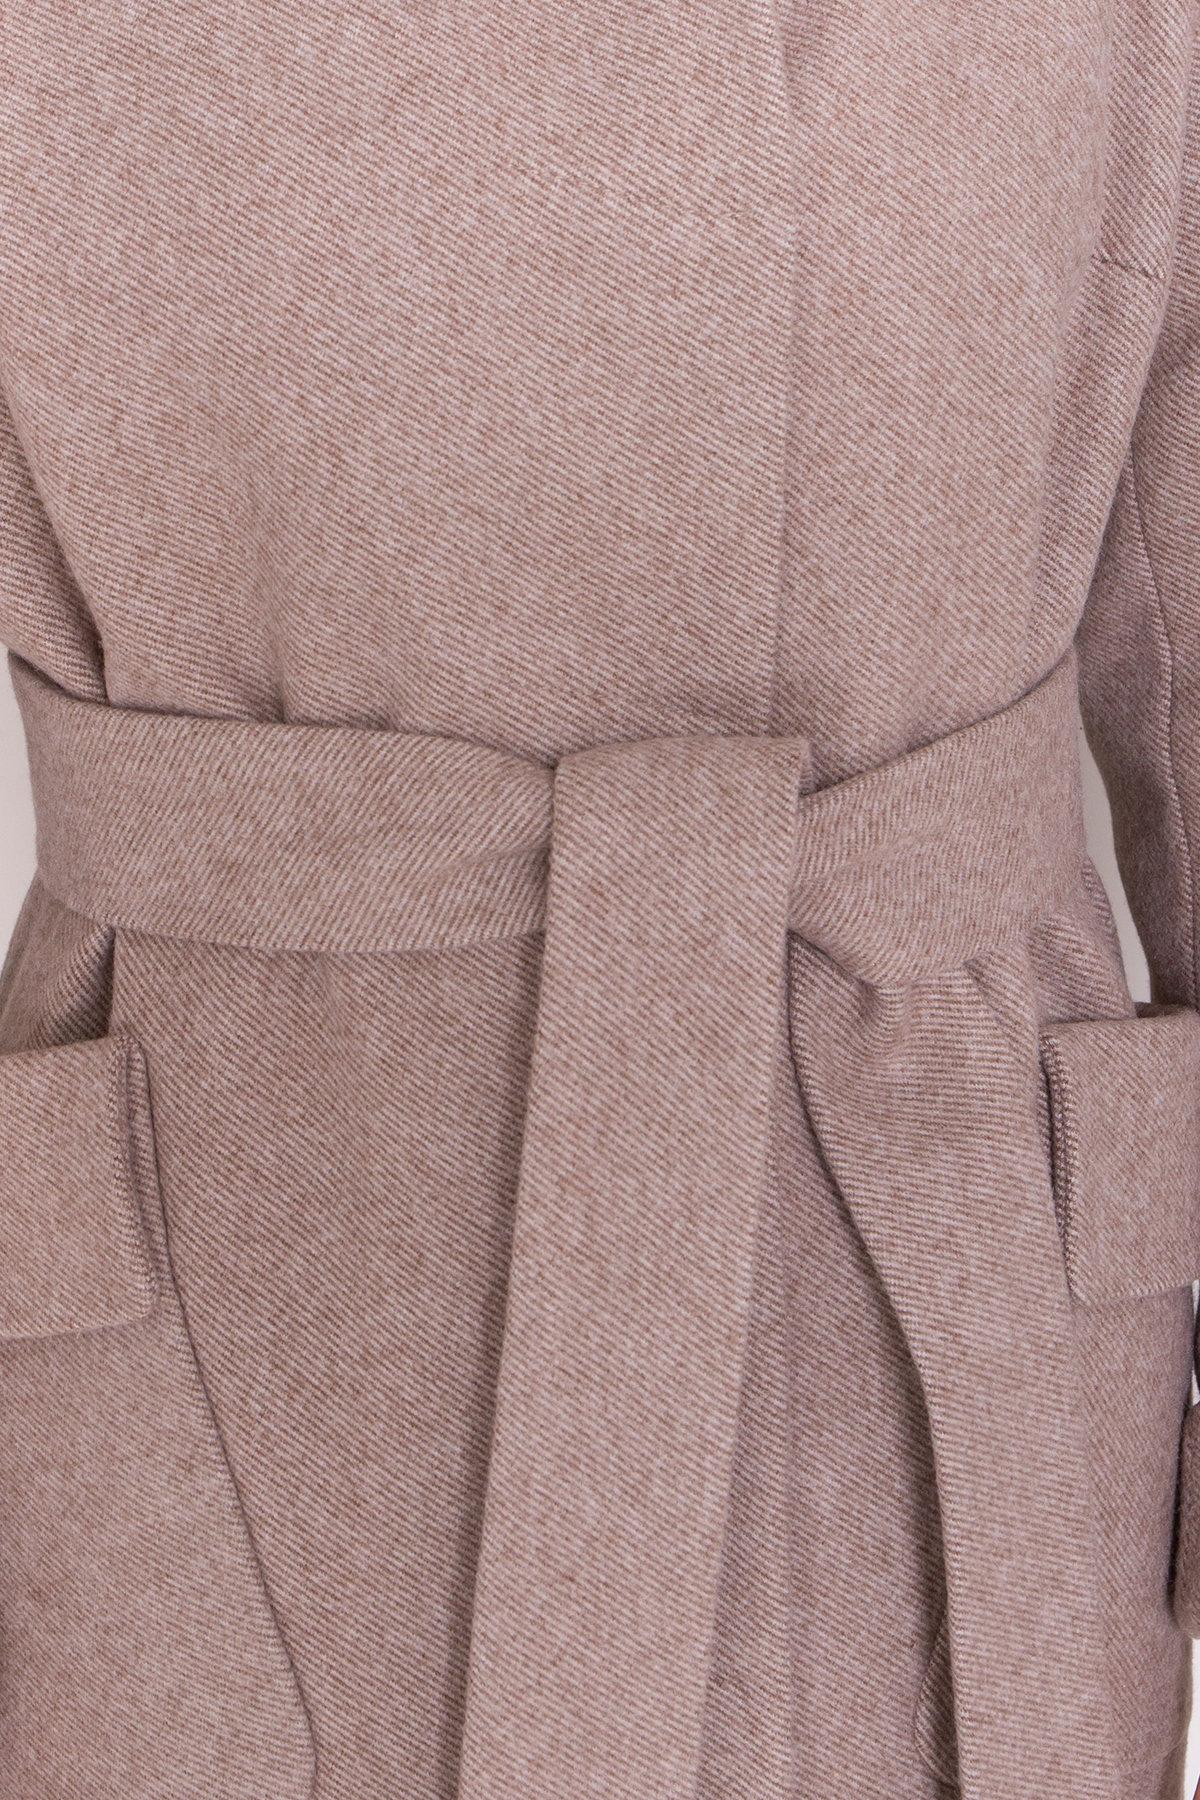 Пальто зима Анджи 8455 АРТ. 44727 Цвет: Бежевый меланж - фото 6, интернет магазин tm-modus.ru